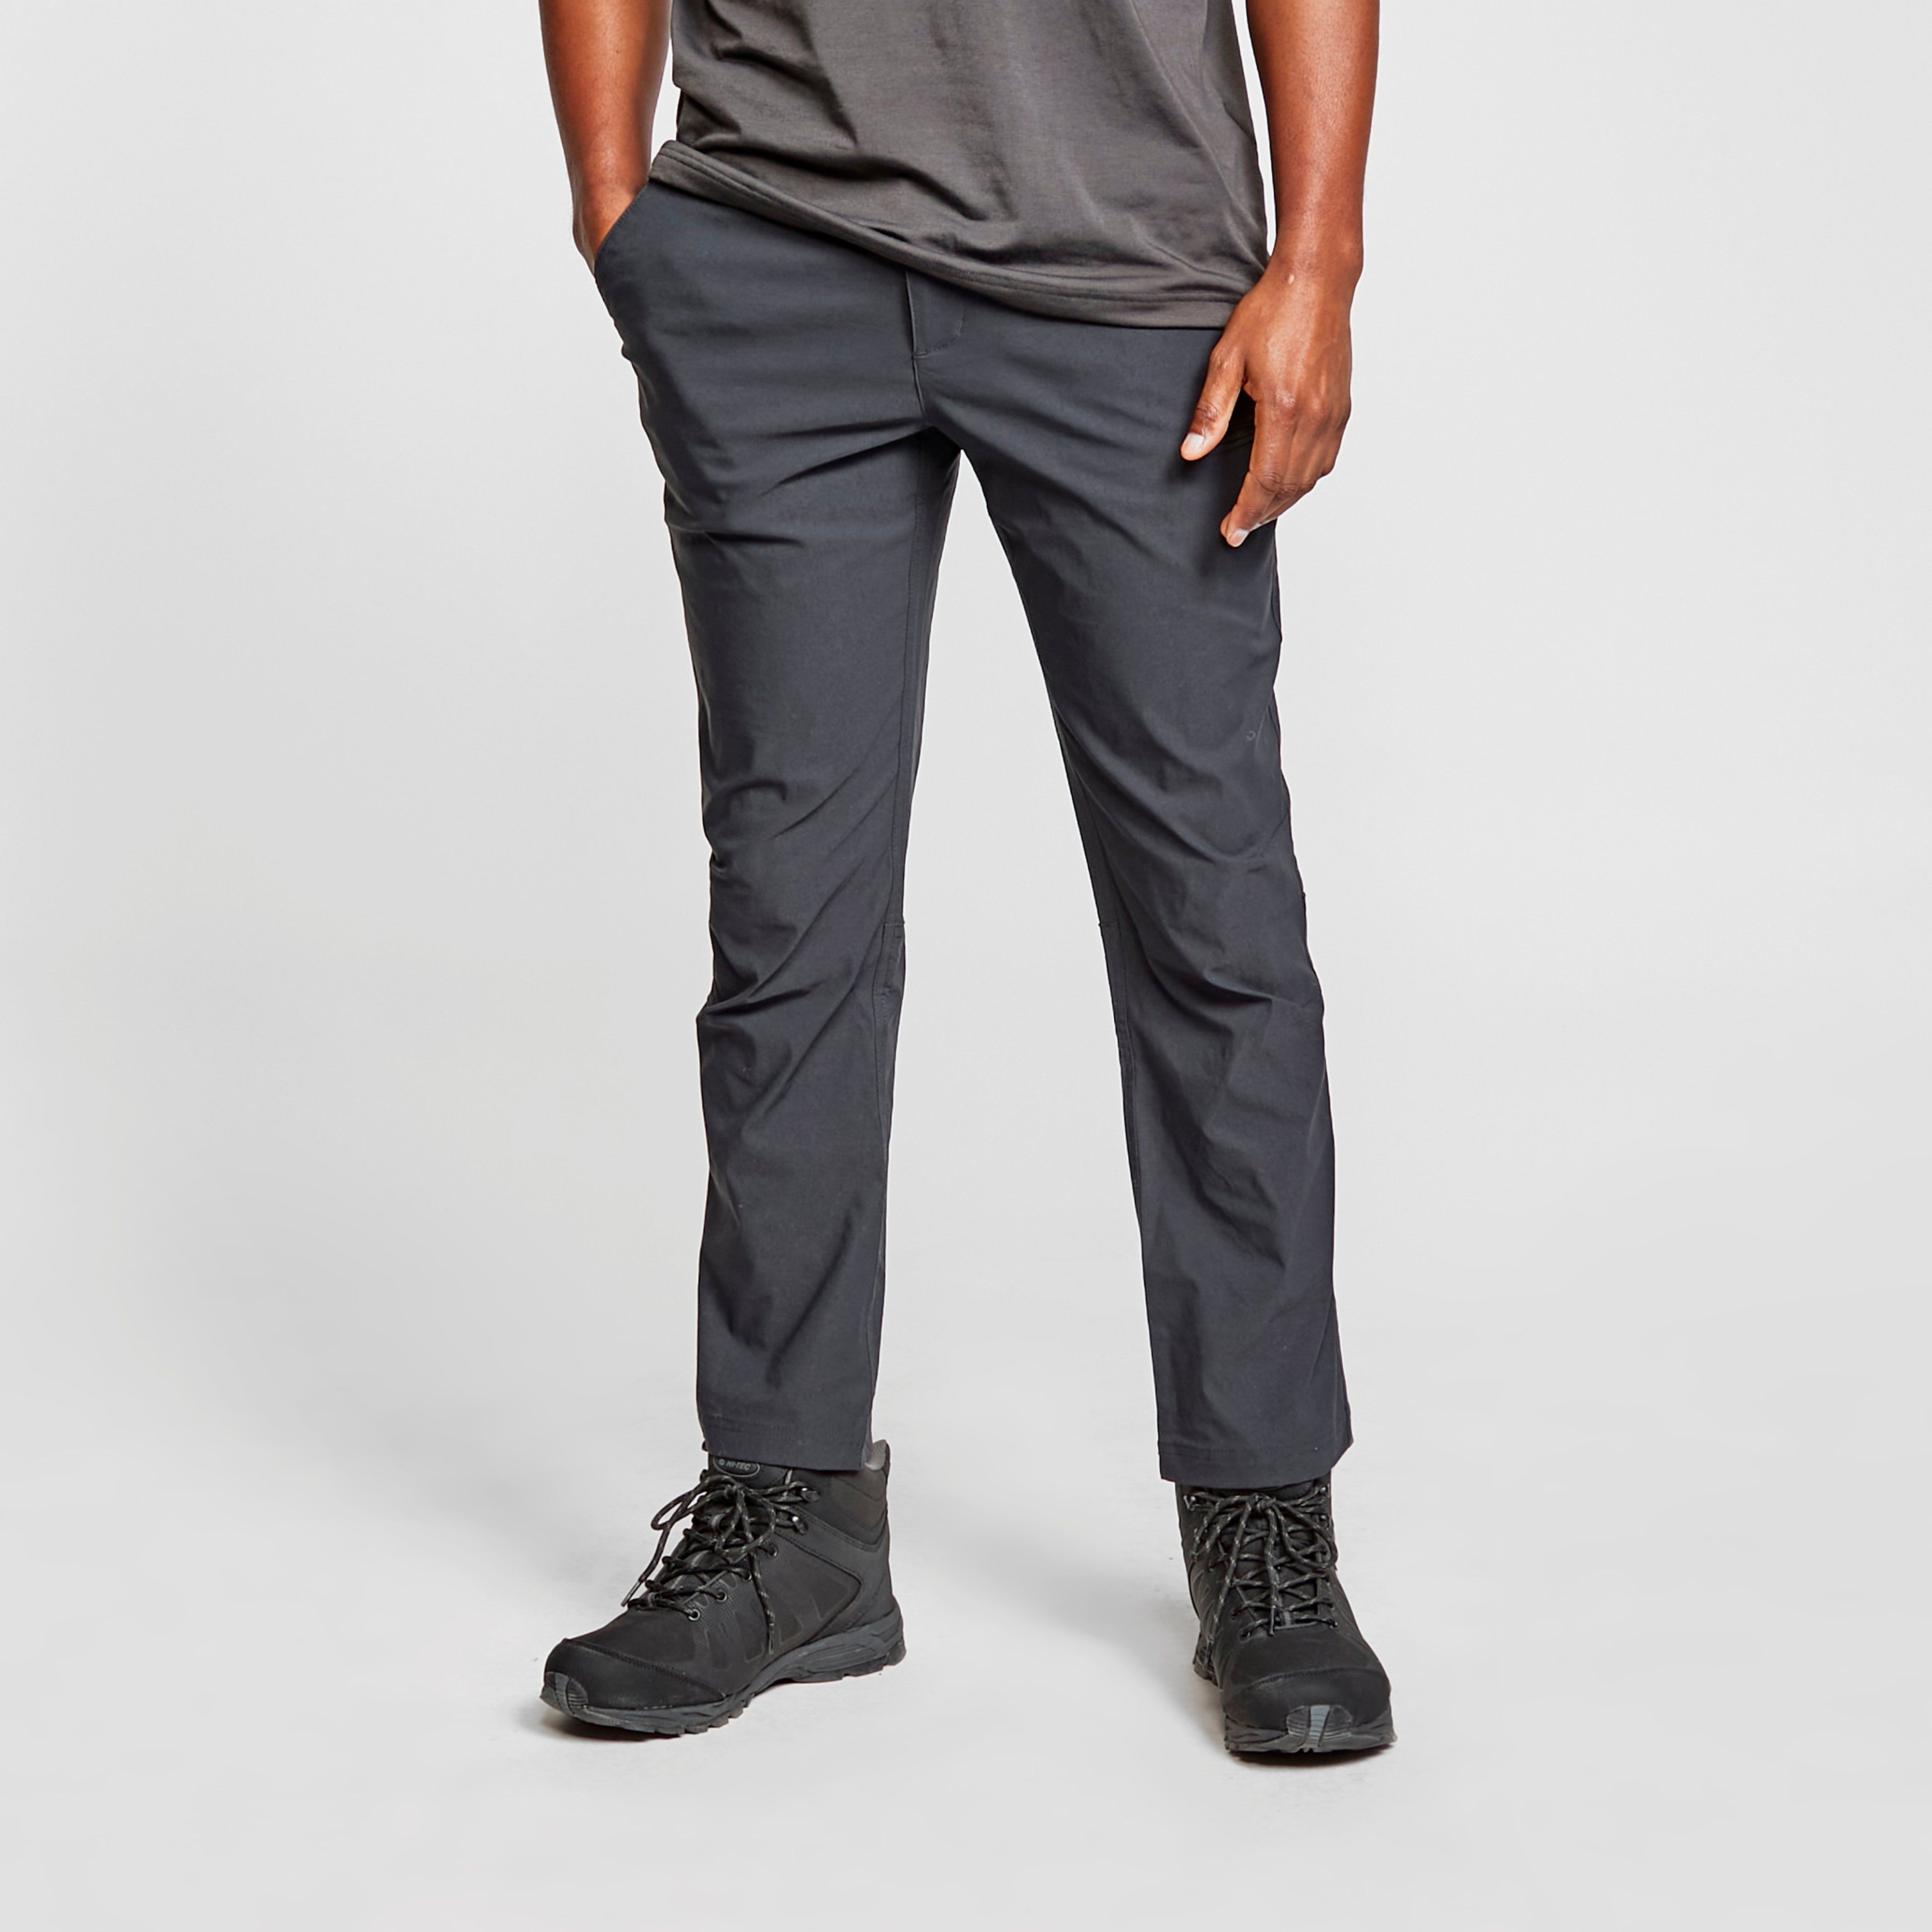 BRASHER Men's Stretch Trousers